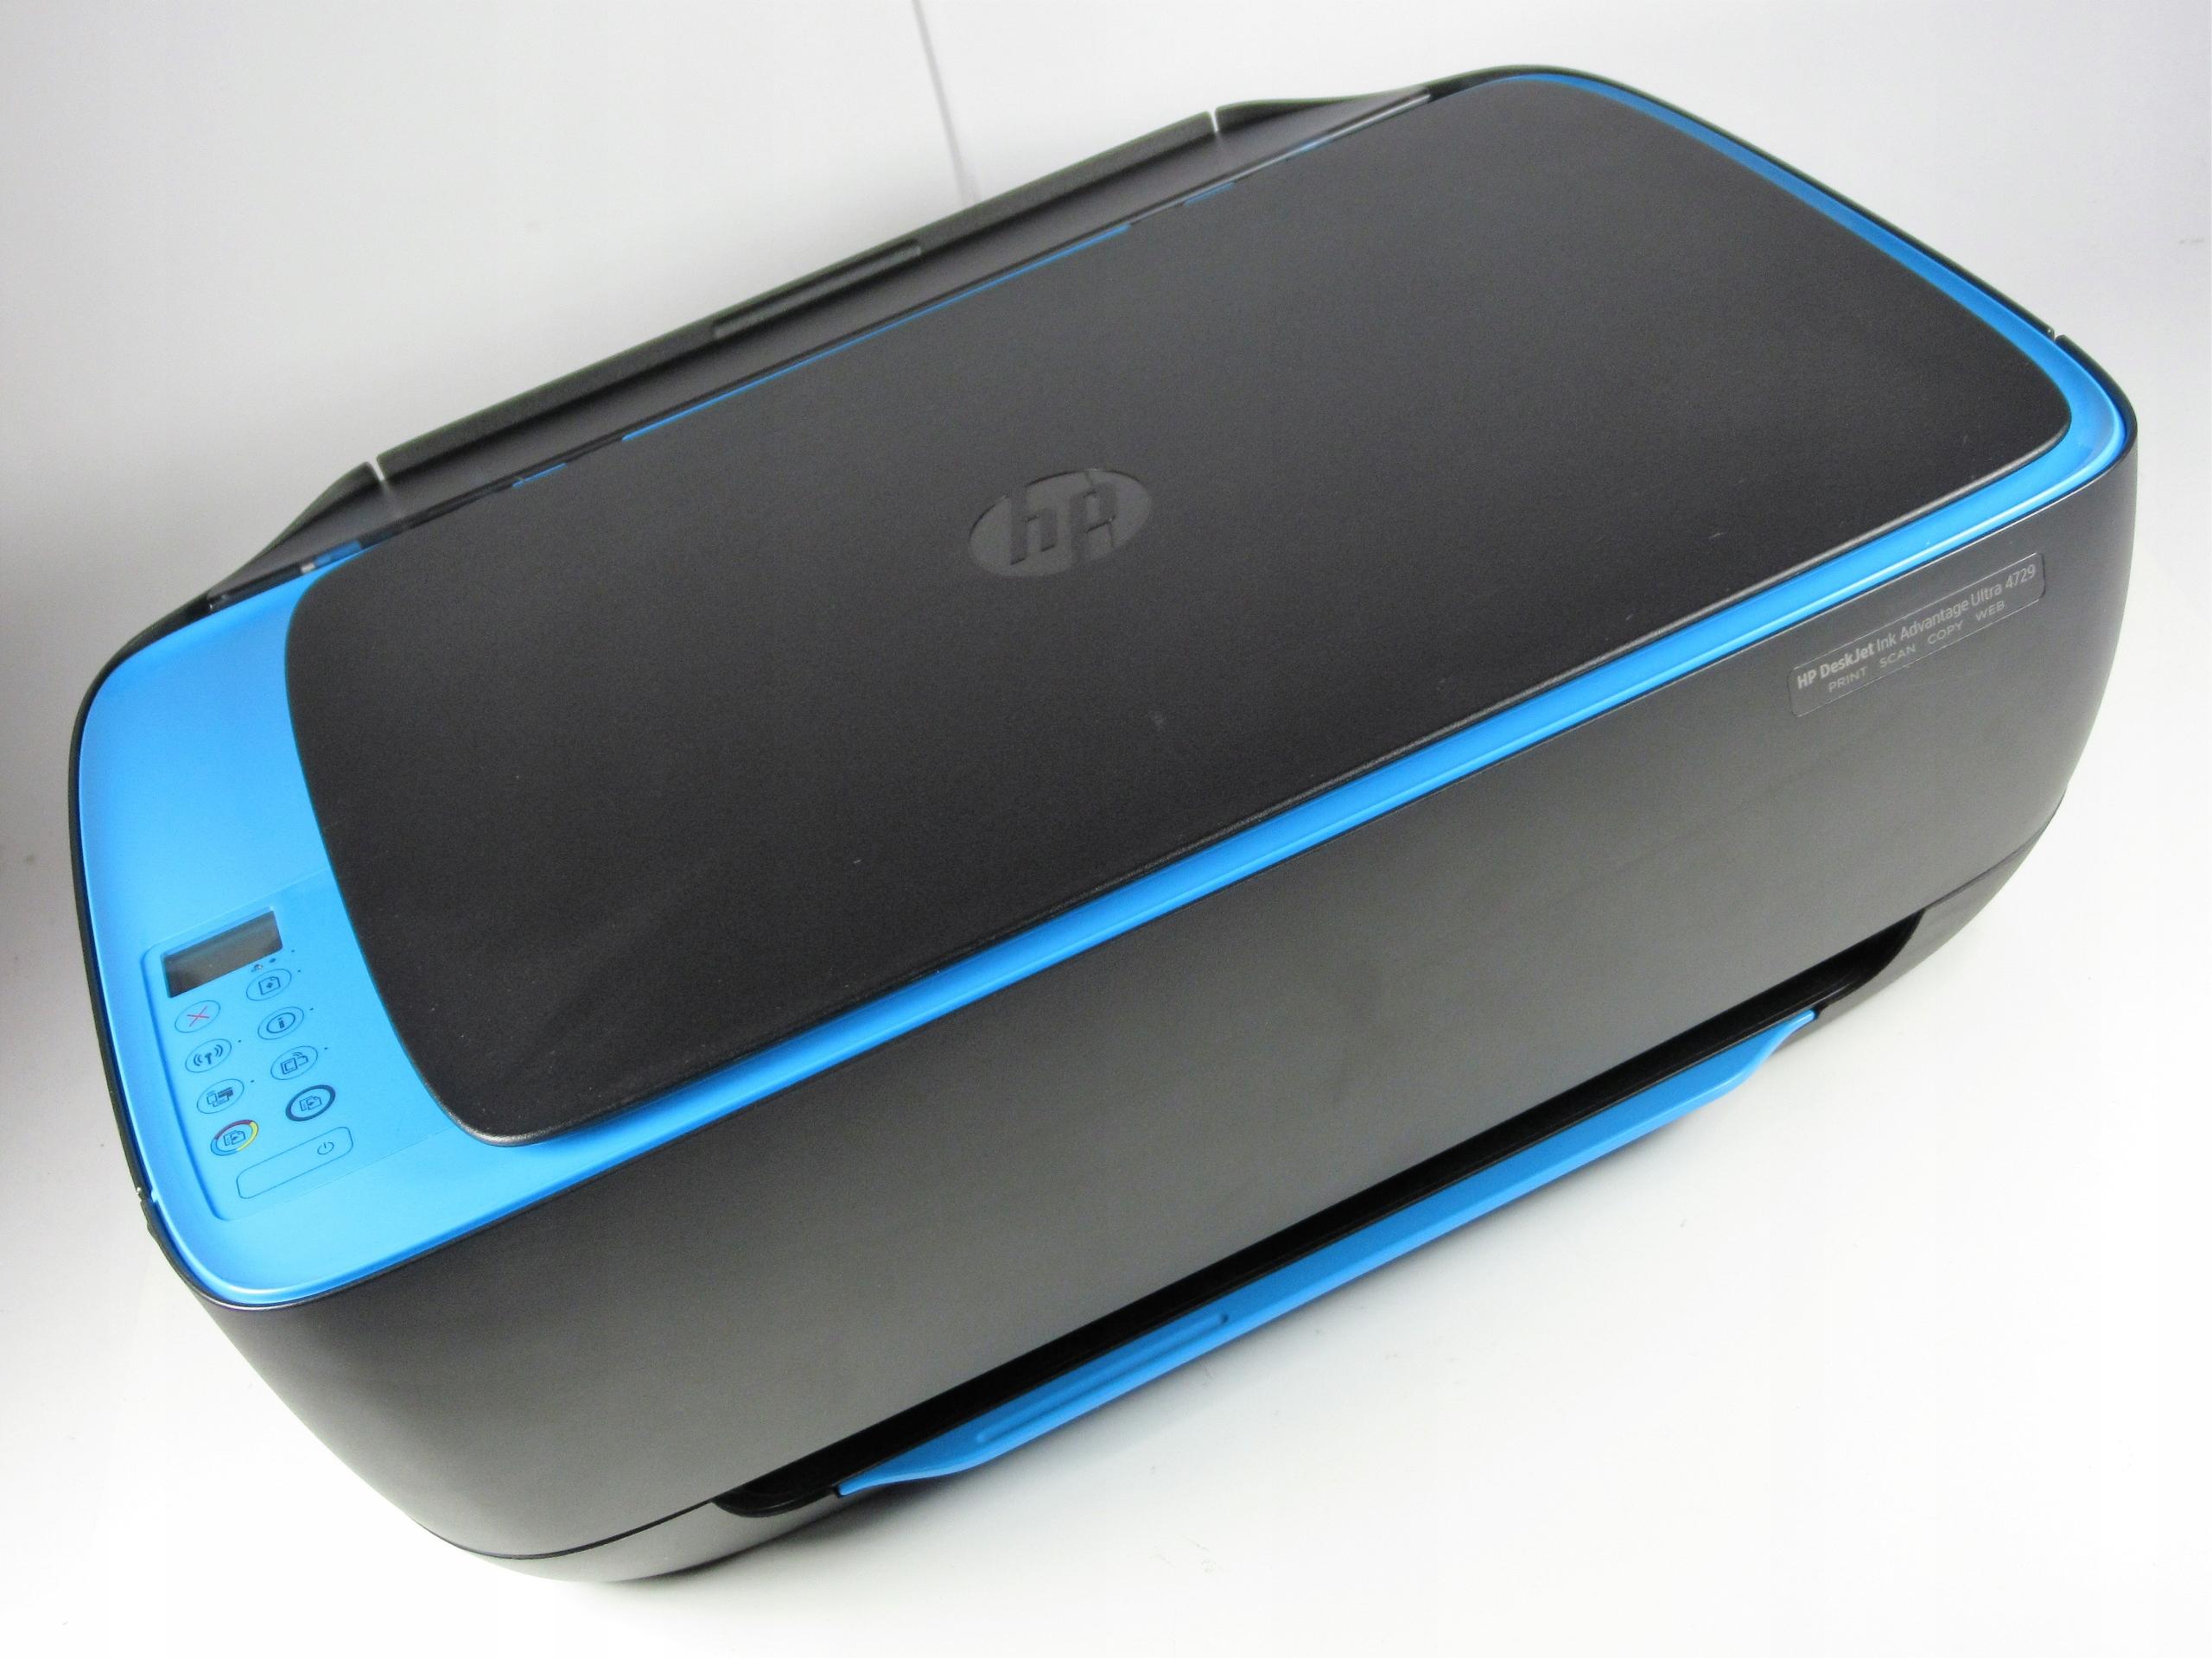 KRFB210 HP DeskJet Ink Advantage Ultra 4729